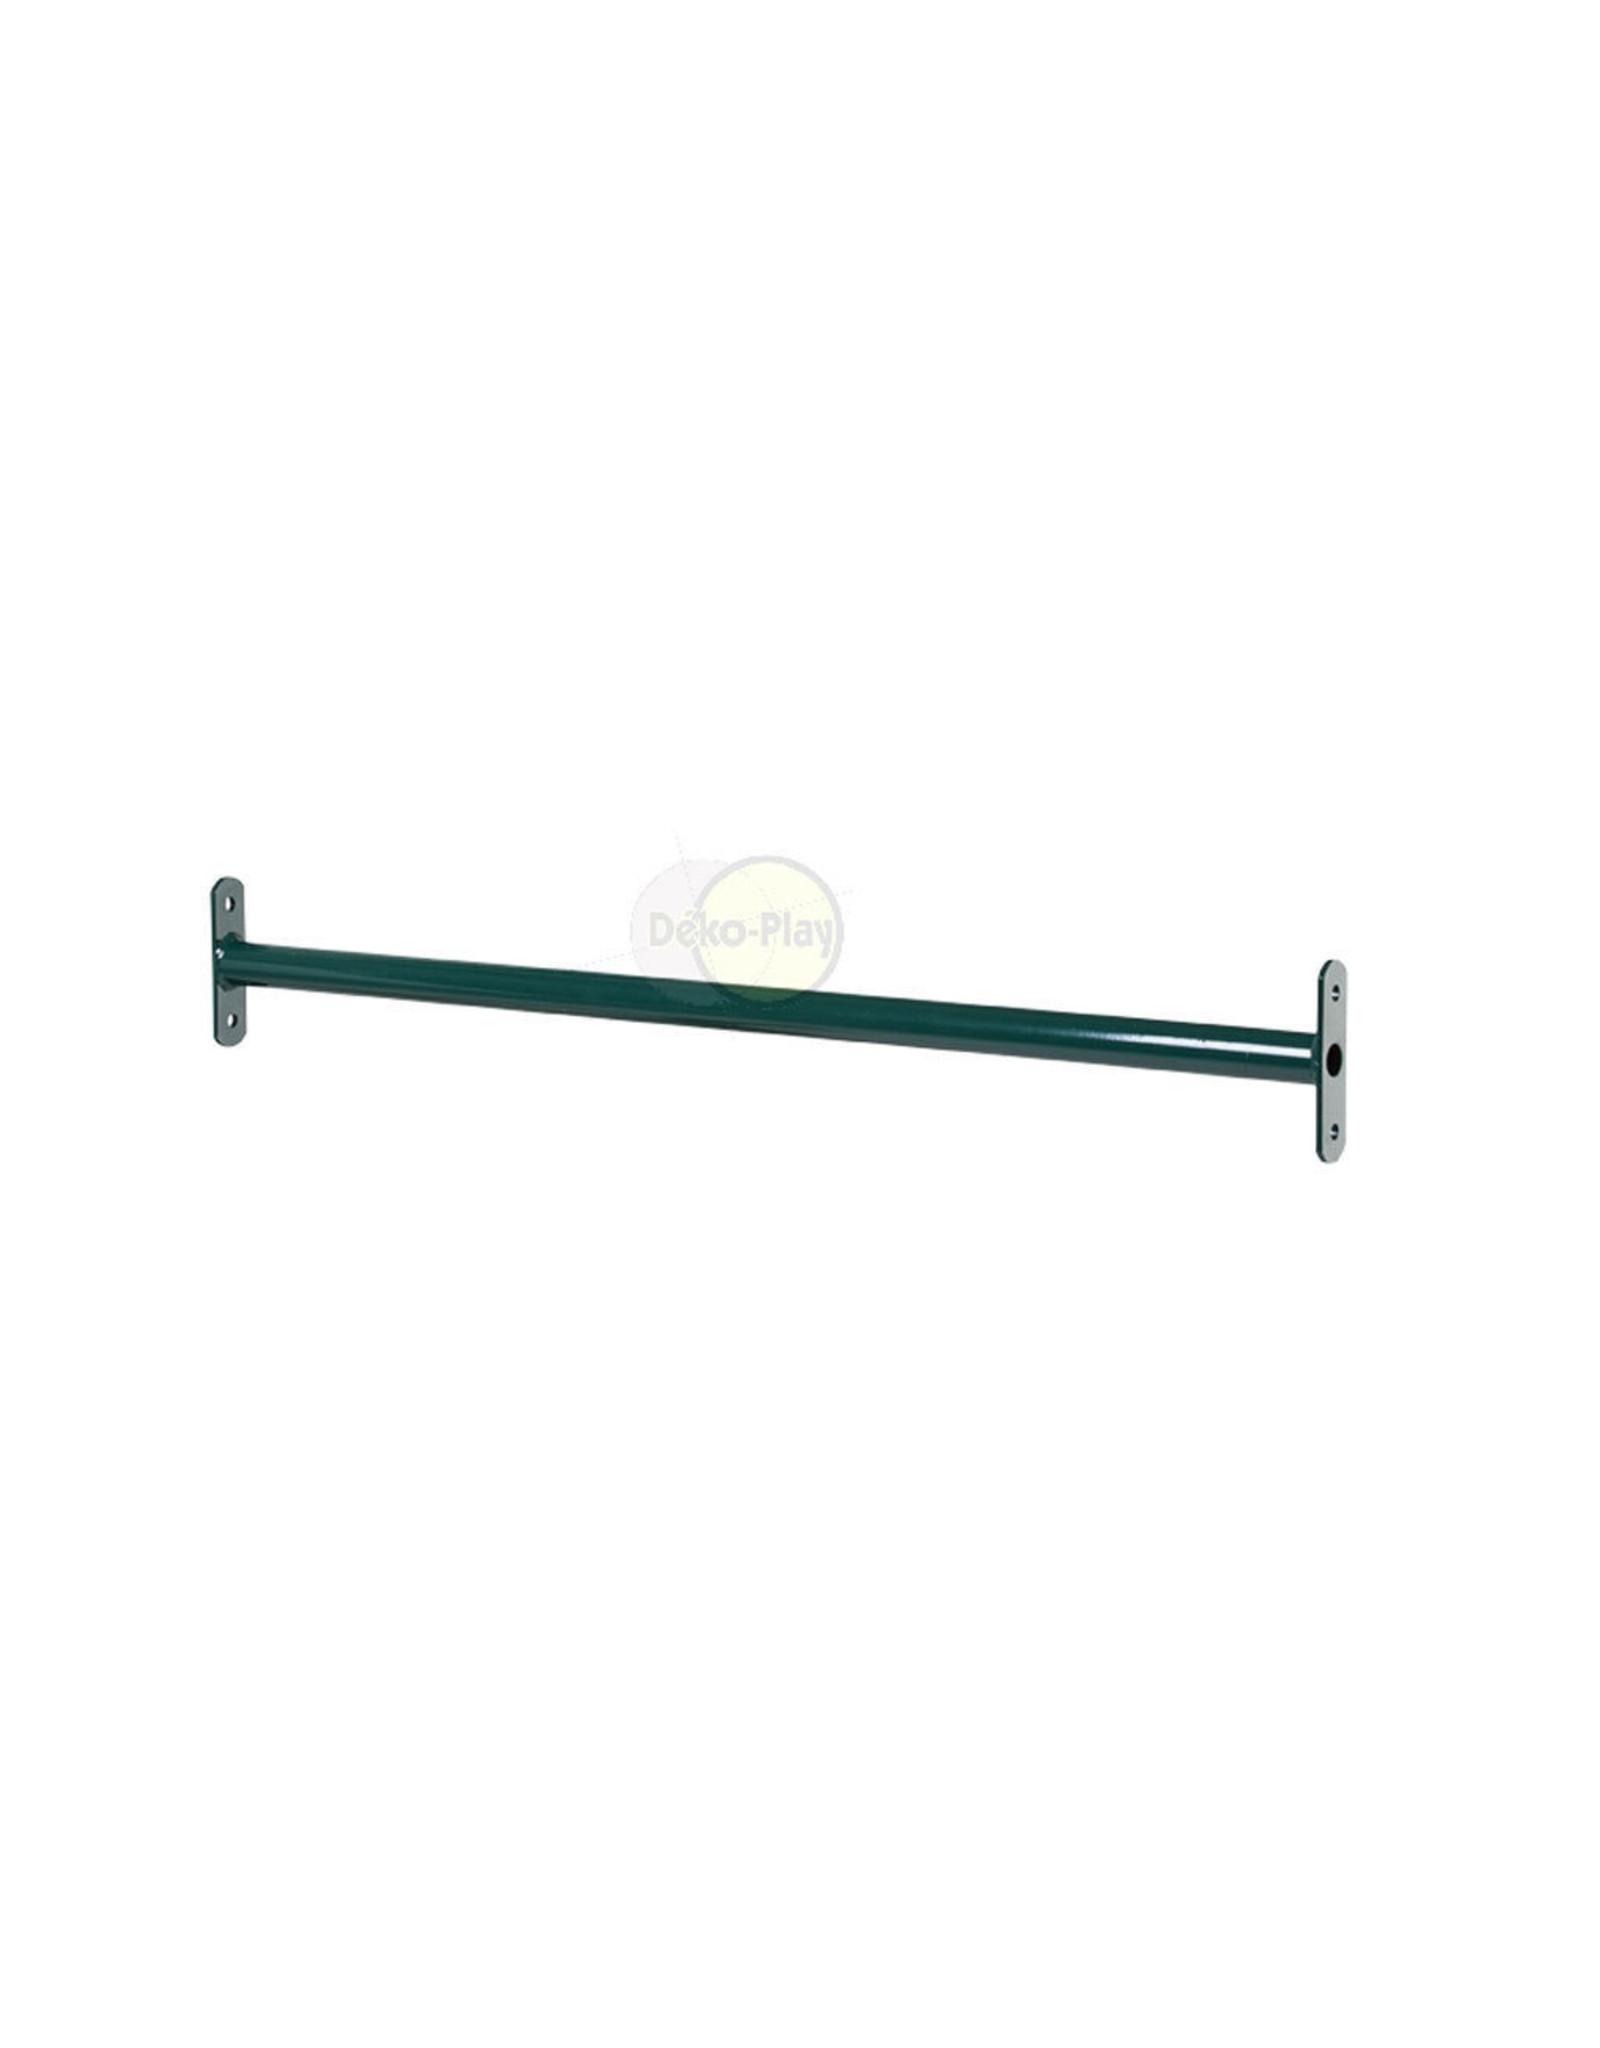 Déko-Play Déko-Play Turnstange Metall grün 125cm